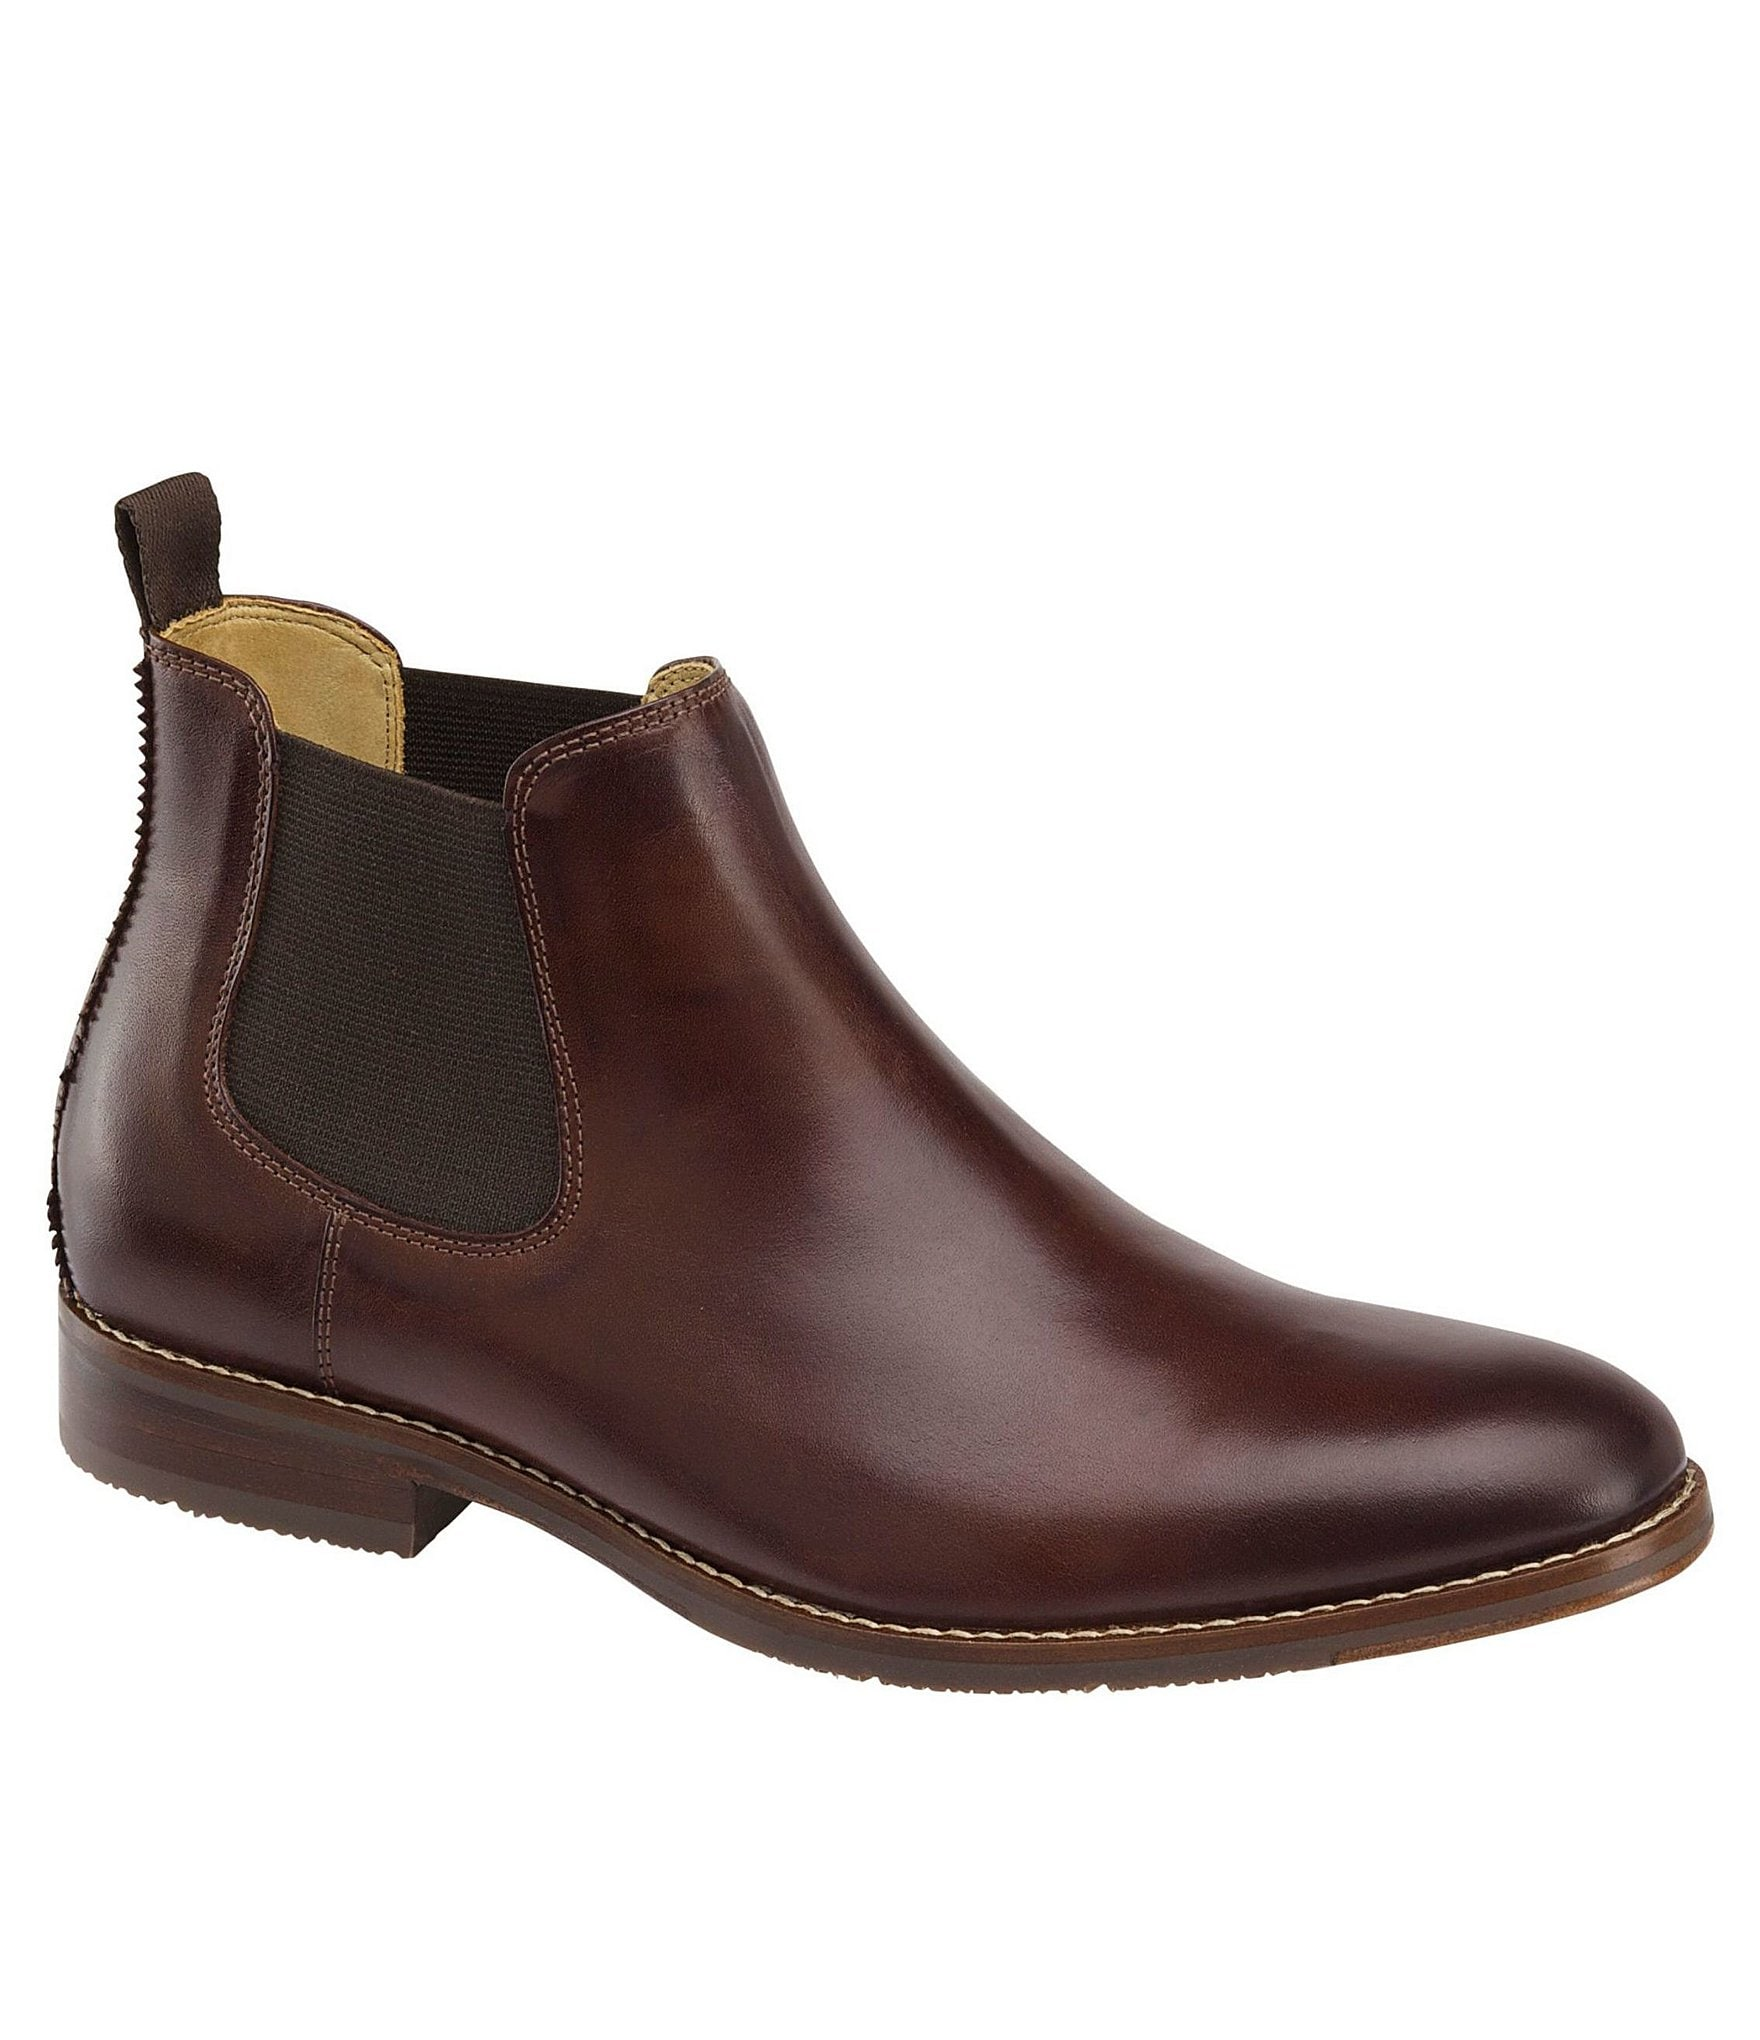 johnston murphy 180 s garner chelsea boots dillards